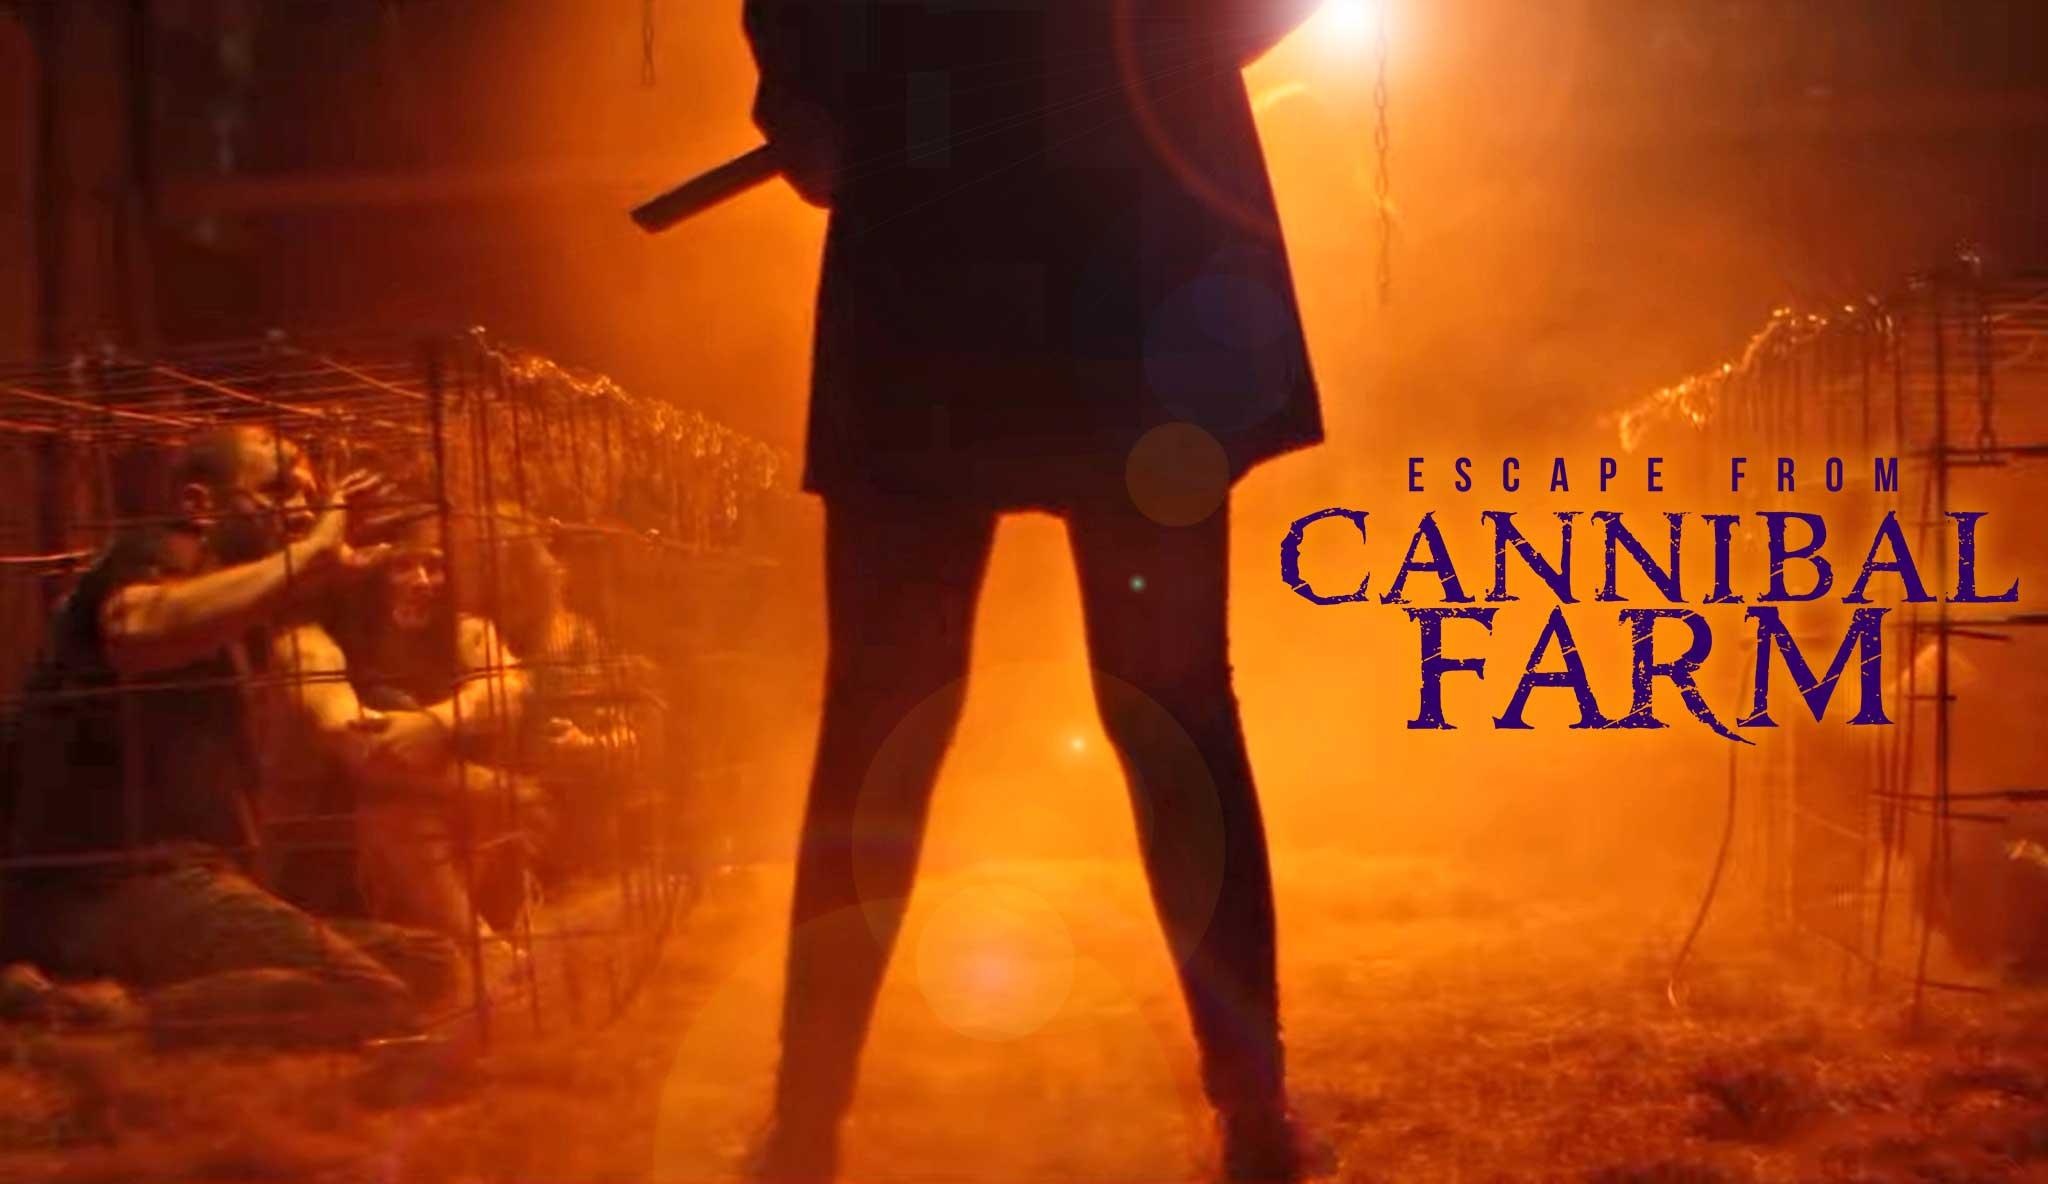 escape-from-cannibal-farm\header.jpg